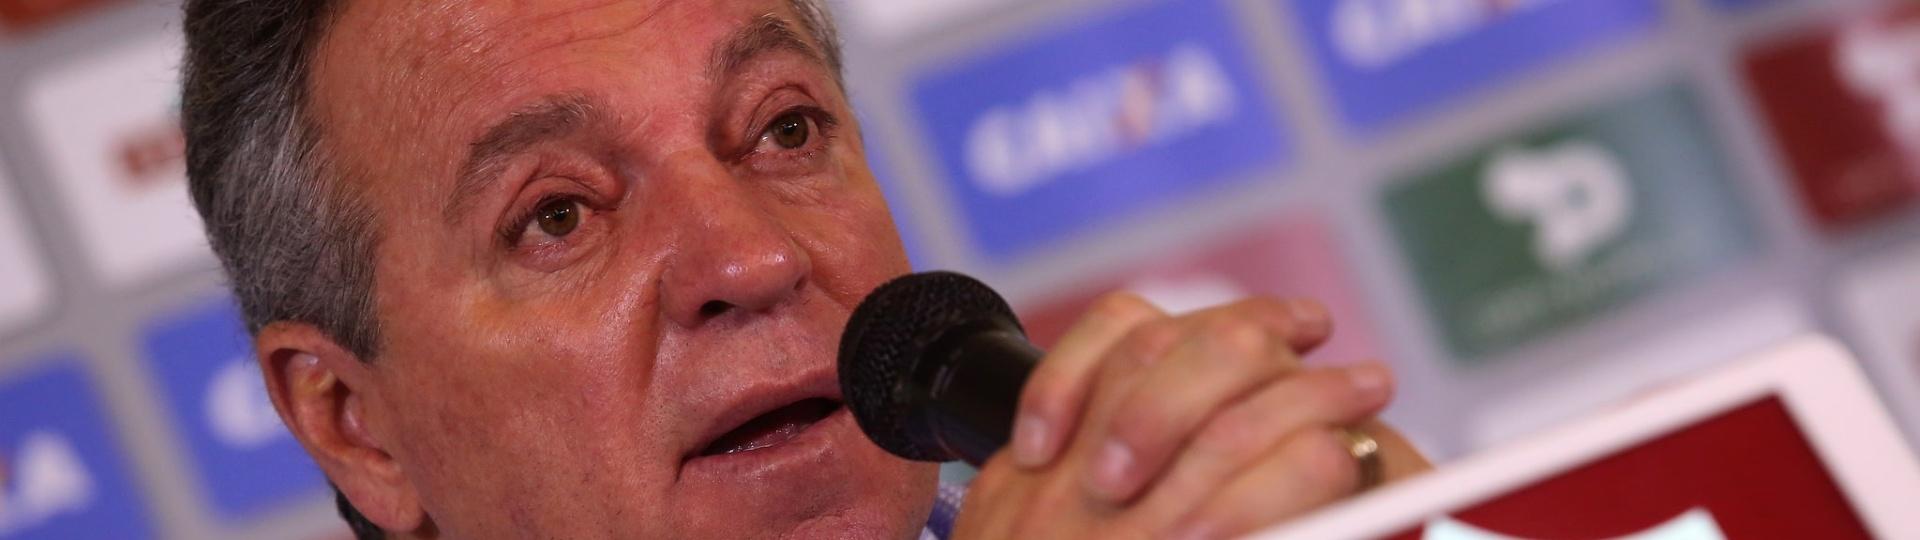 Técnico Abel Braga volta para a terceira passagem pelo Fluminense